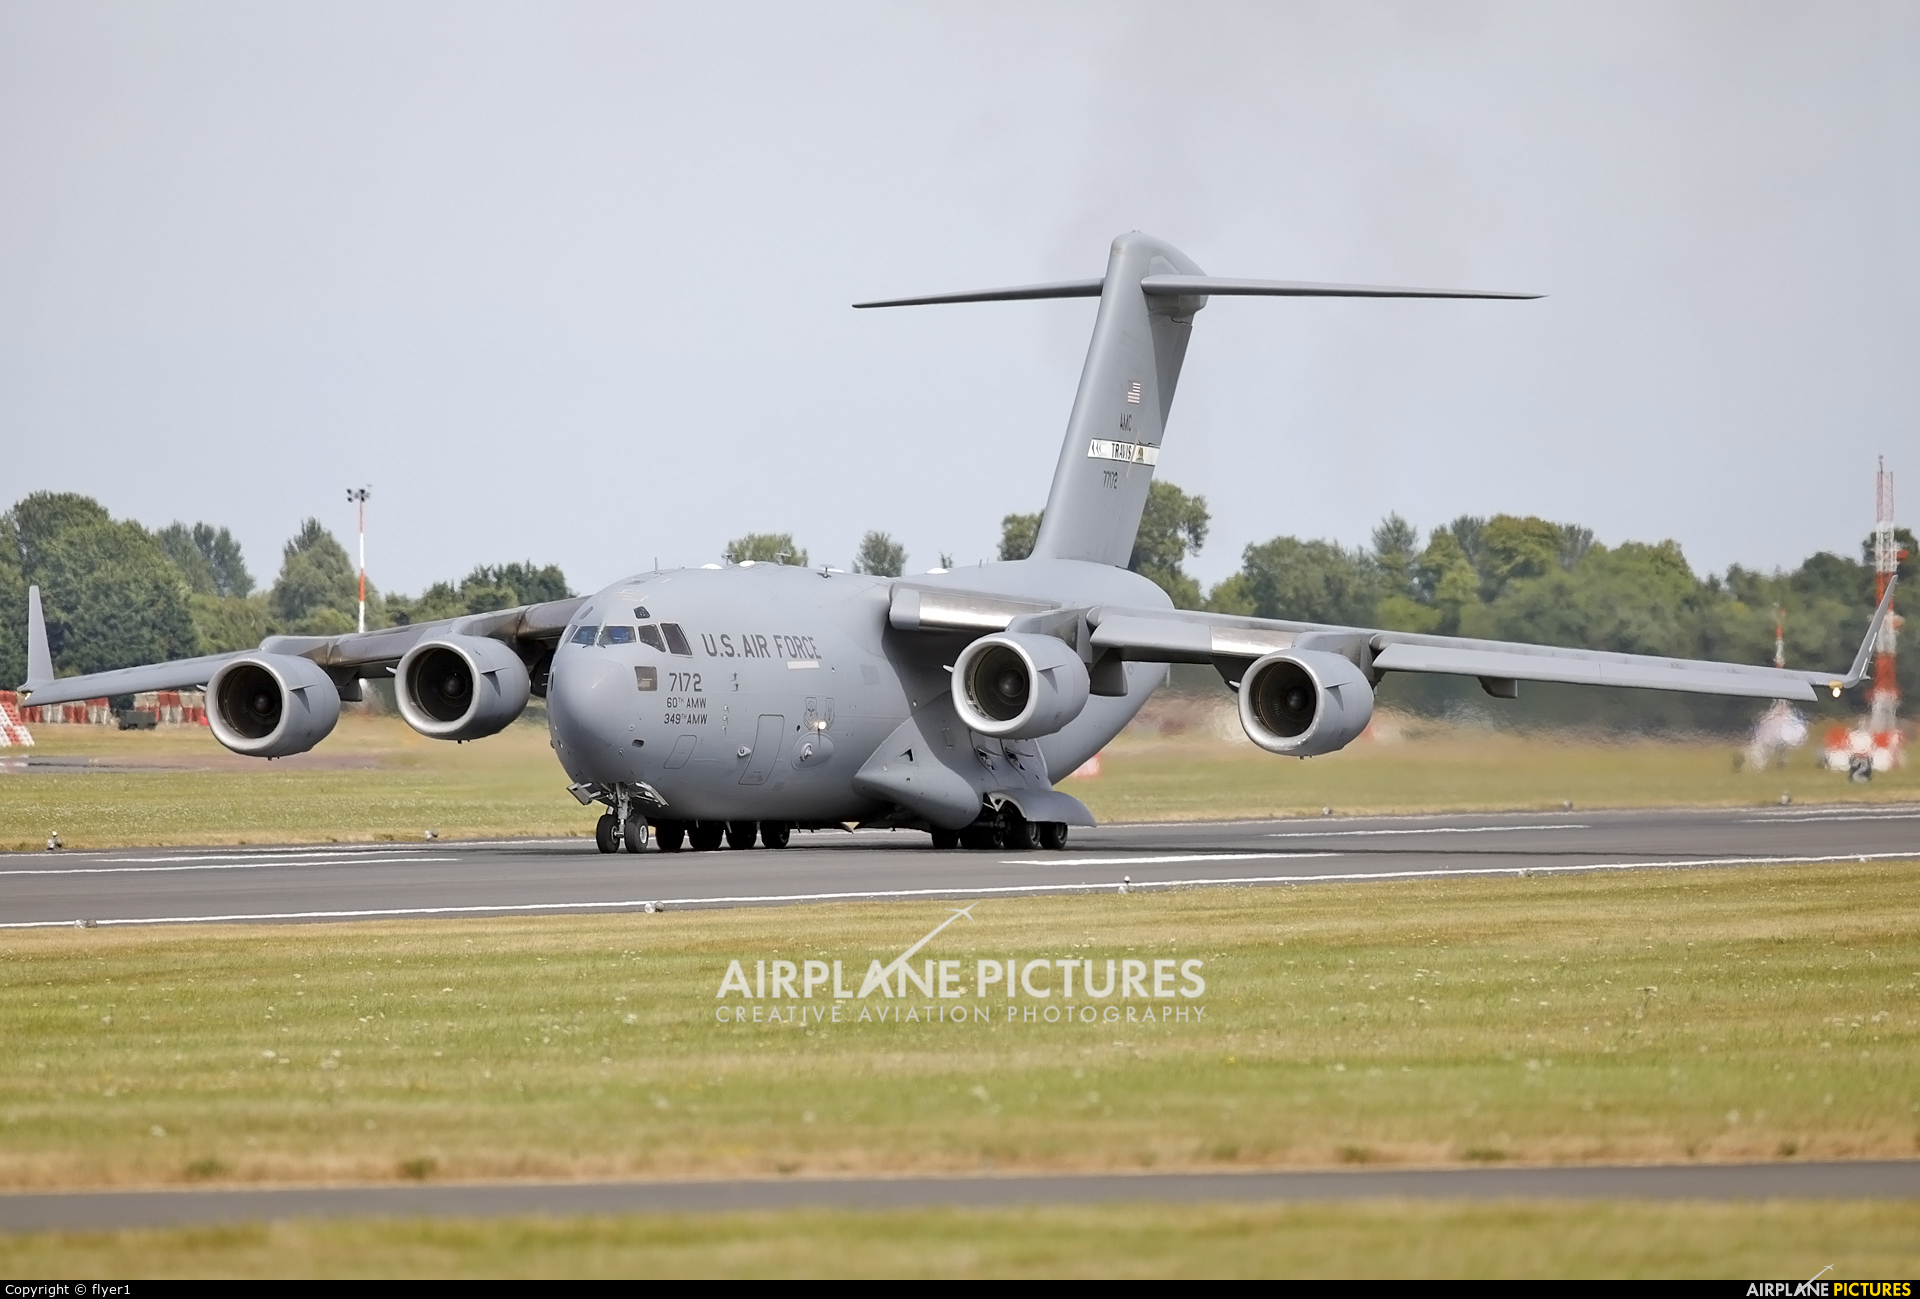 USA - Air Force 07-7172 aircraft at Fairford